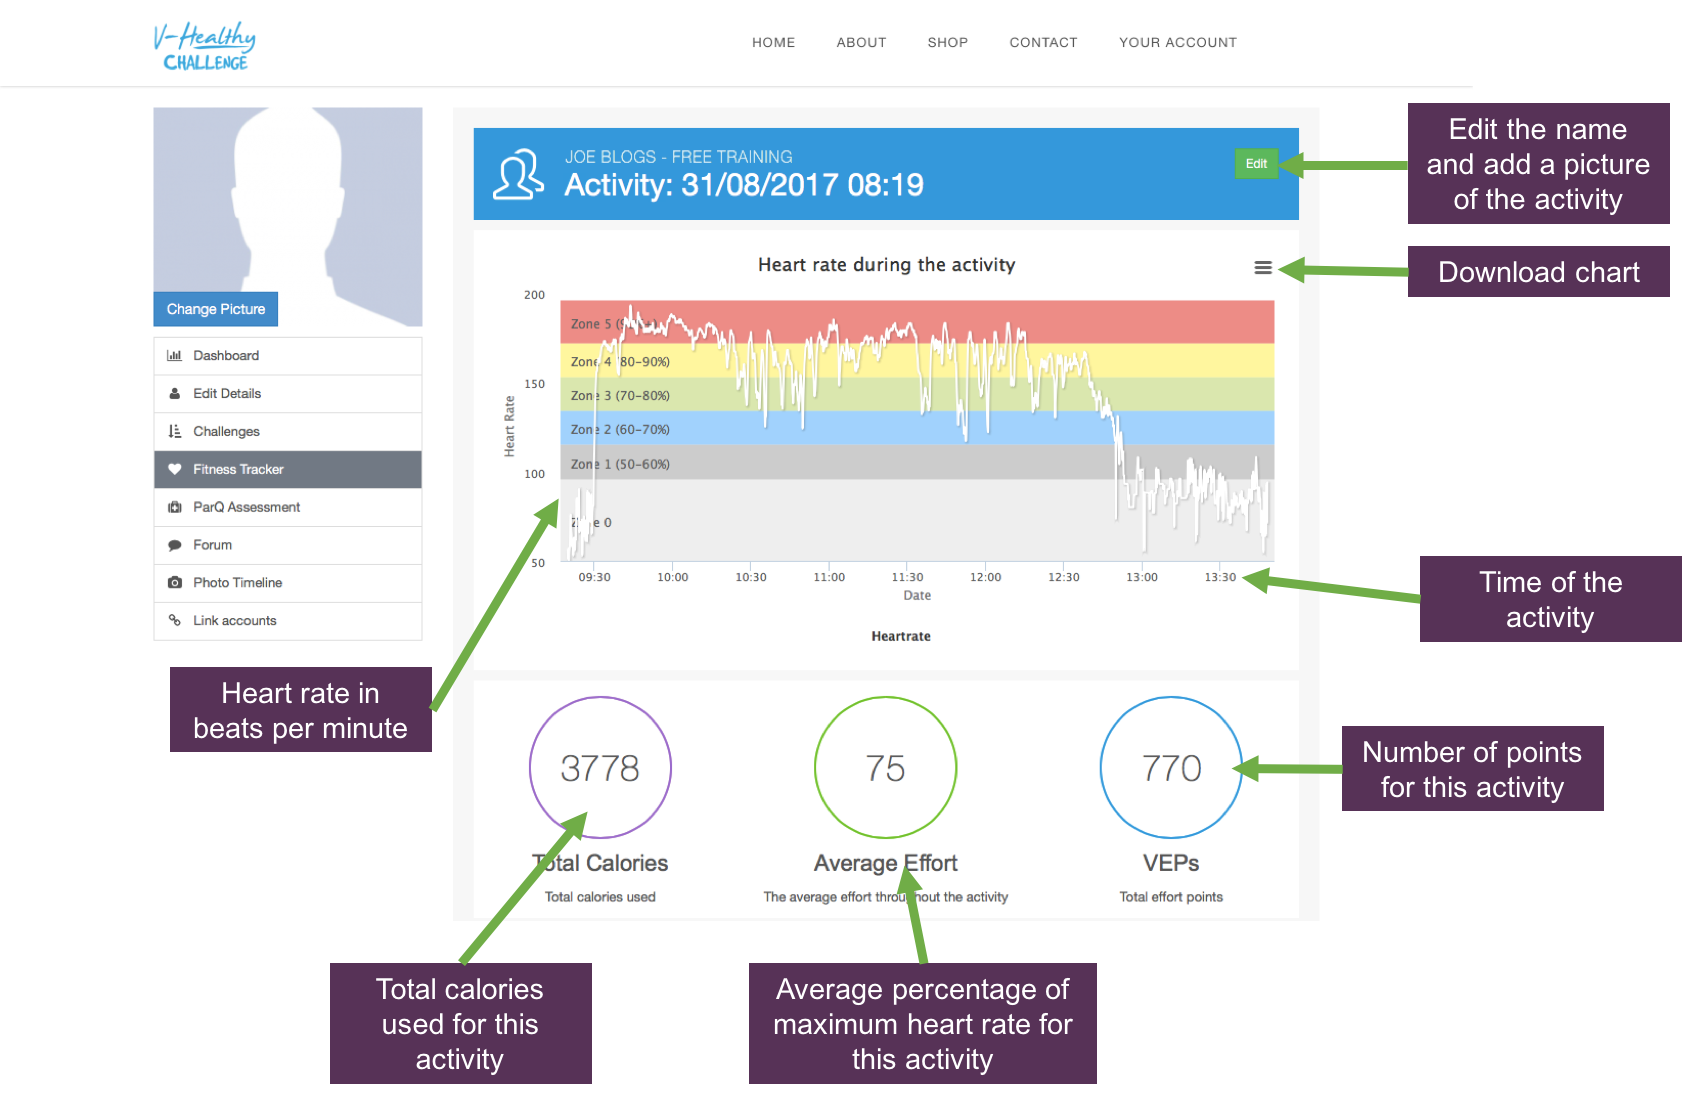 screenshot of v-healthy activity page